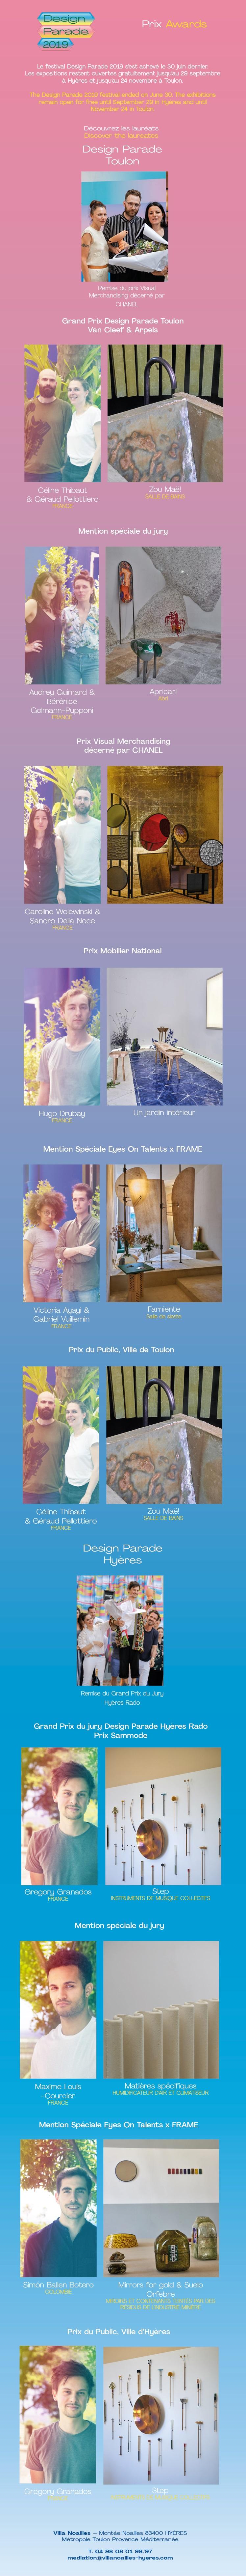 Prix Design Parade Toulon 2019